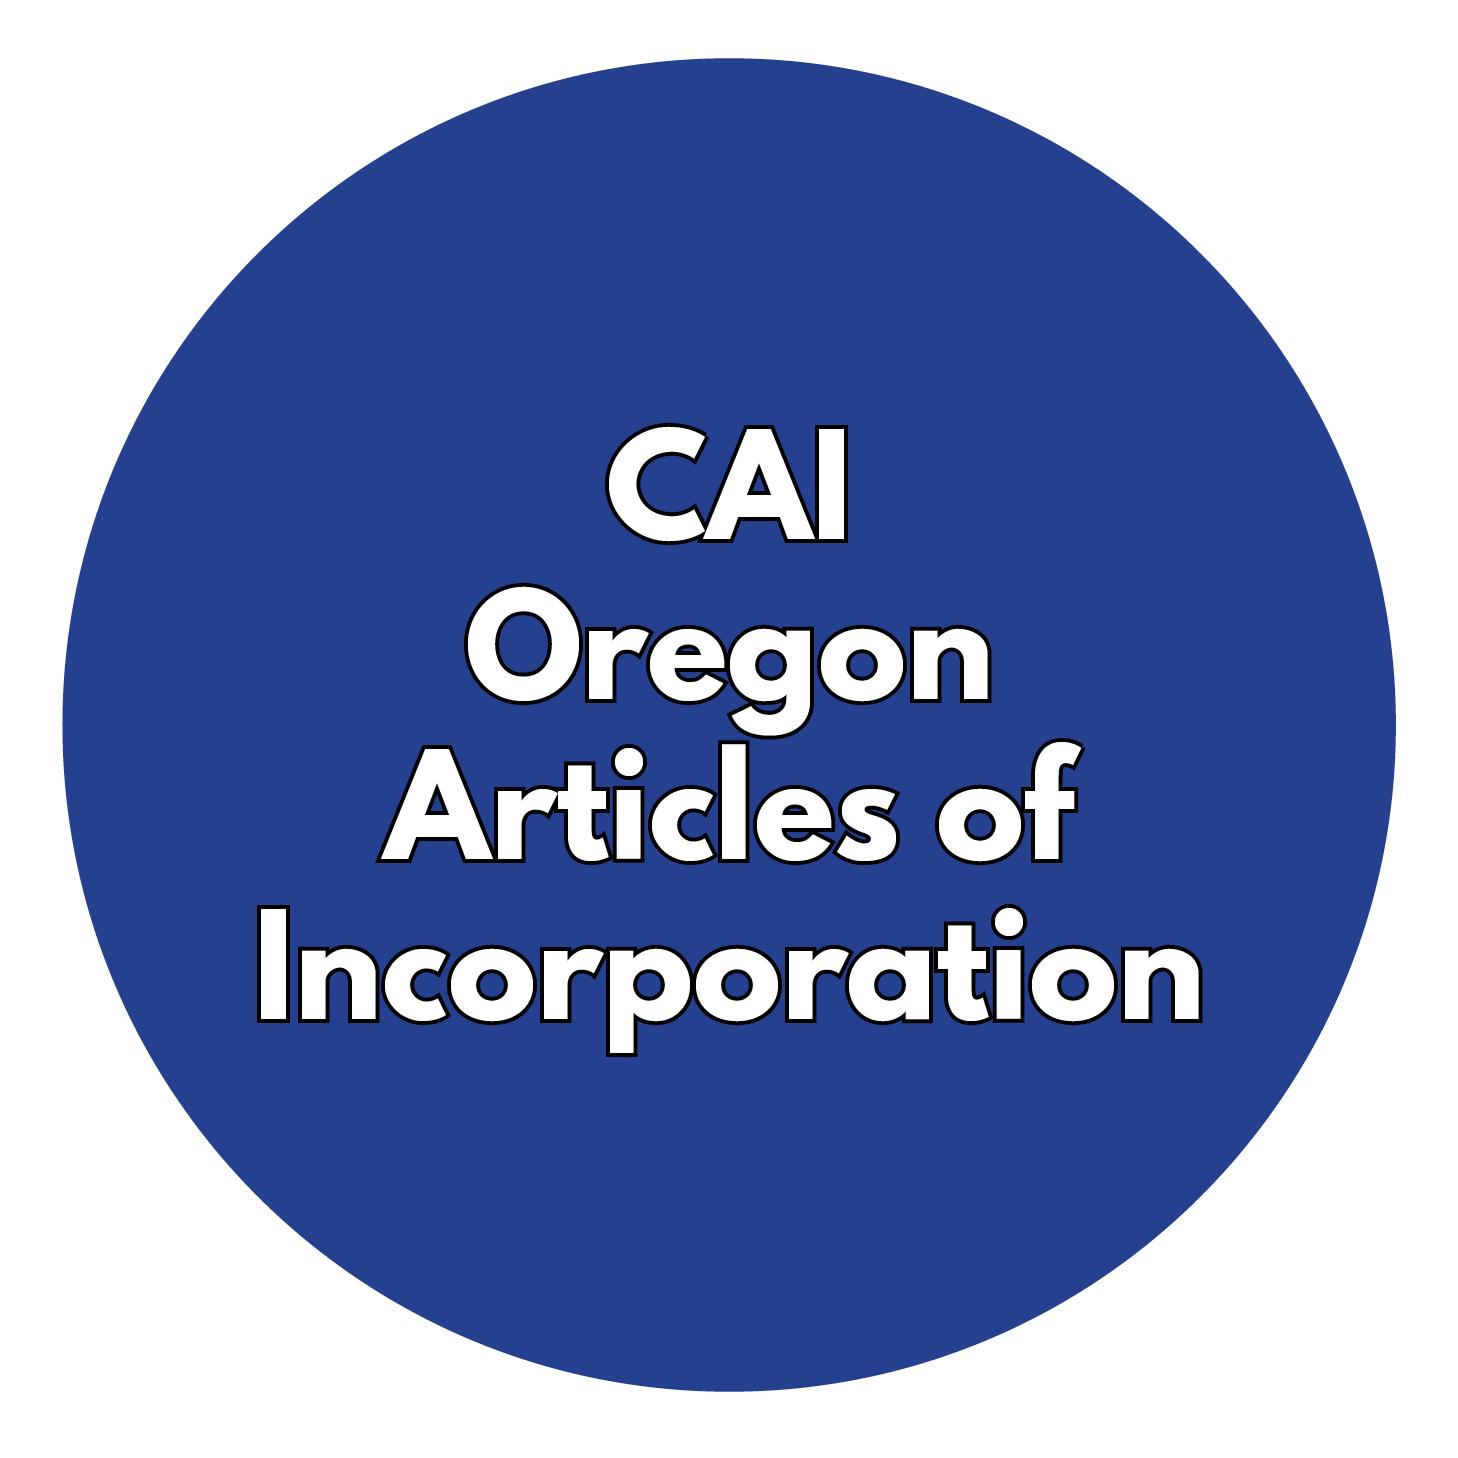 cai oregon articles of incorporation.jpg